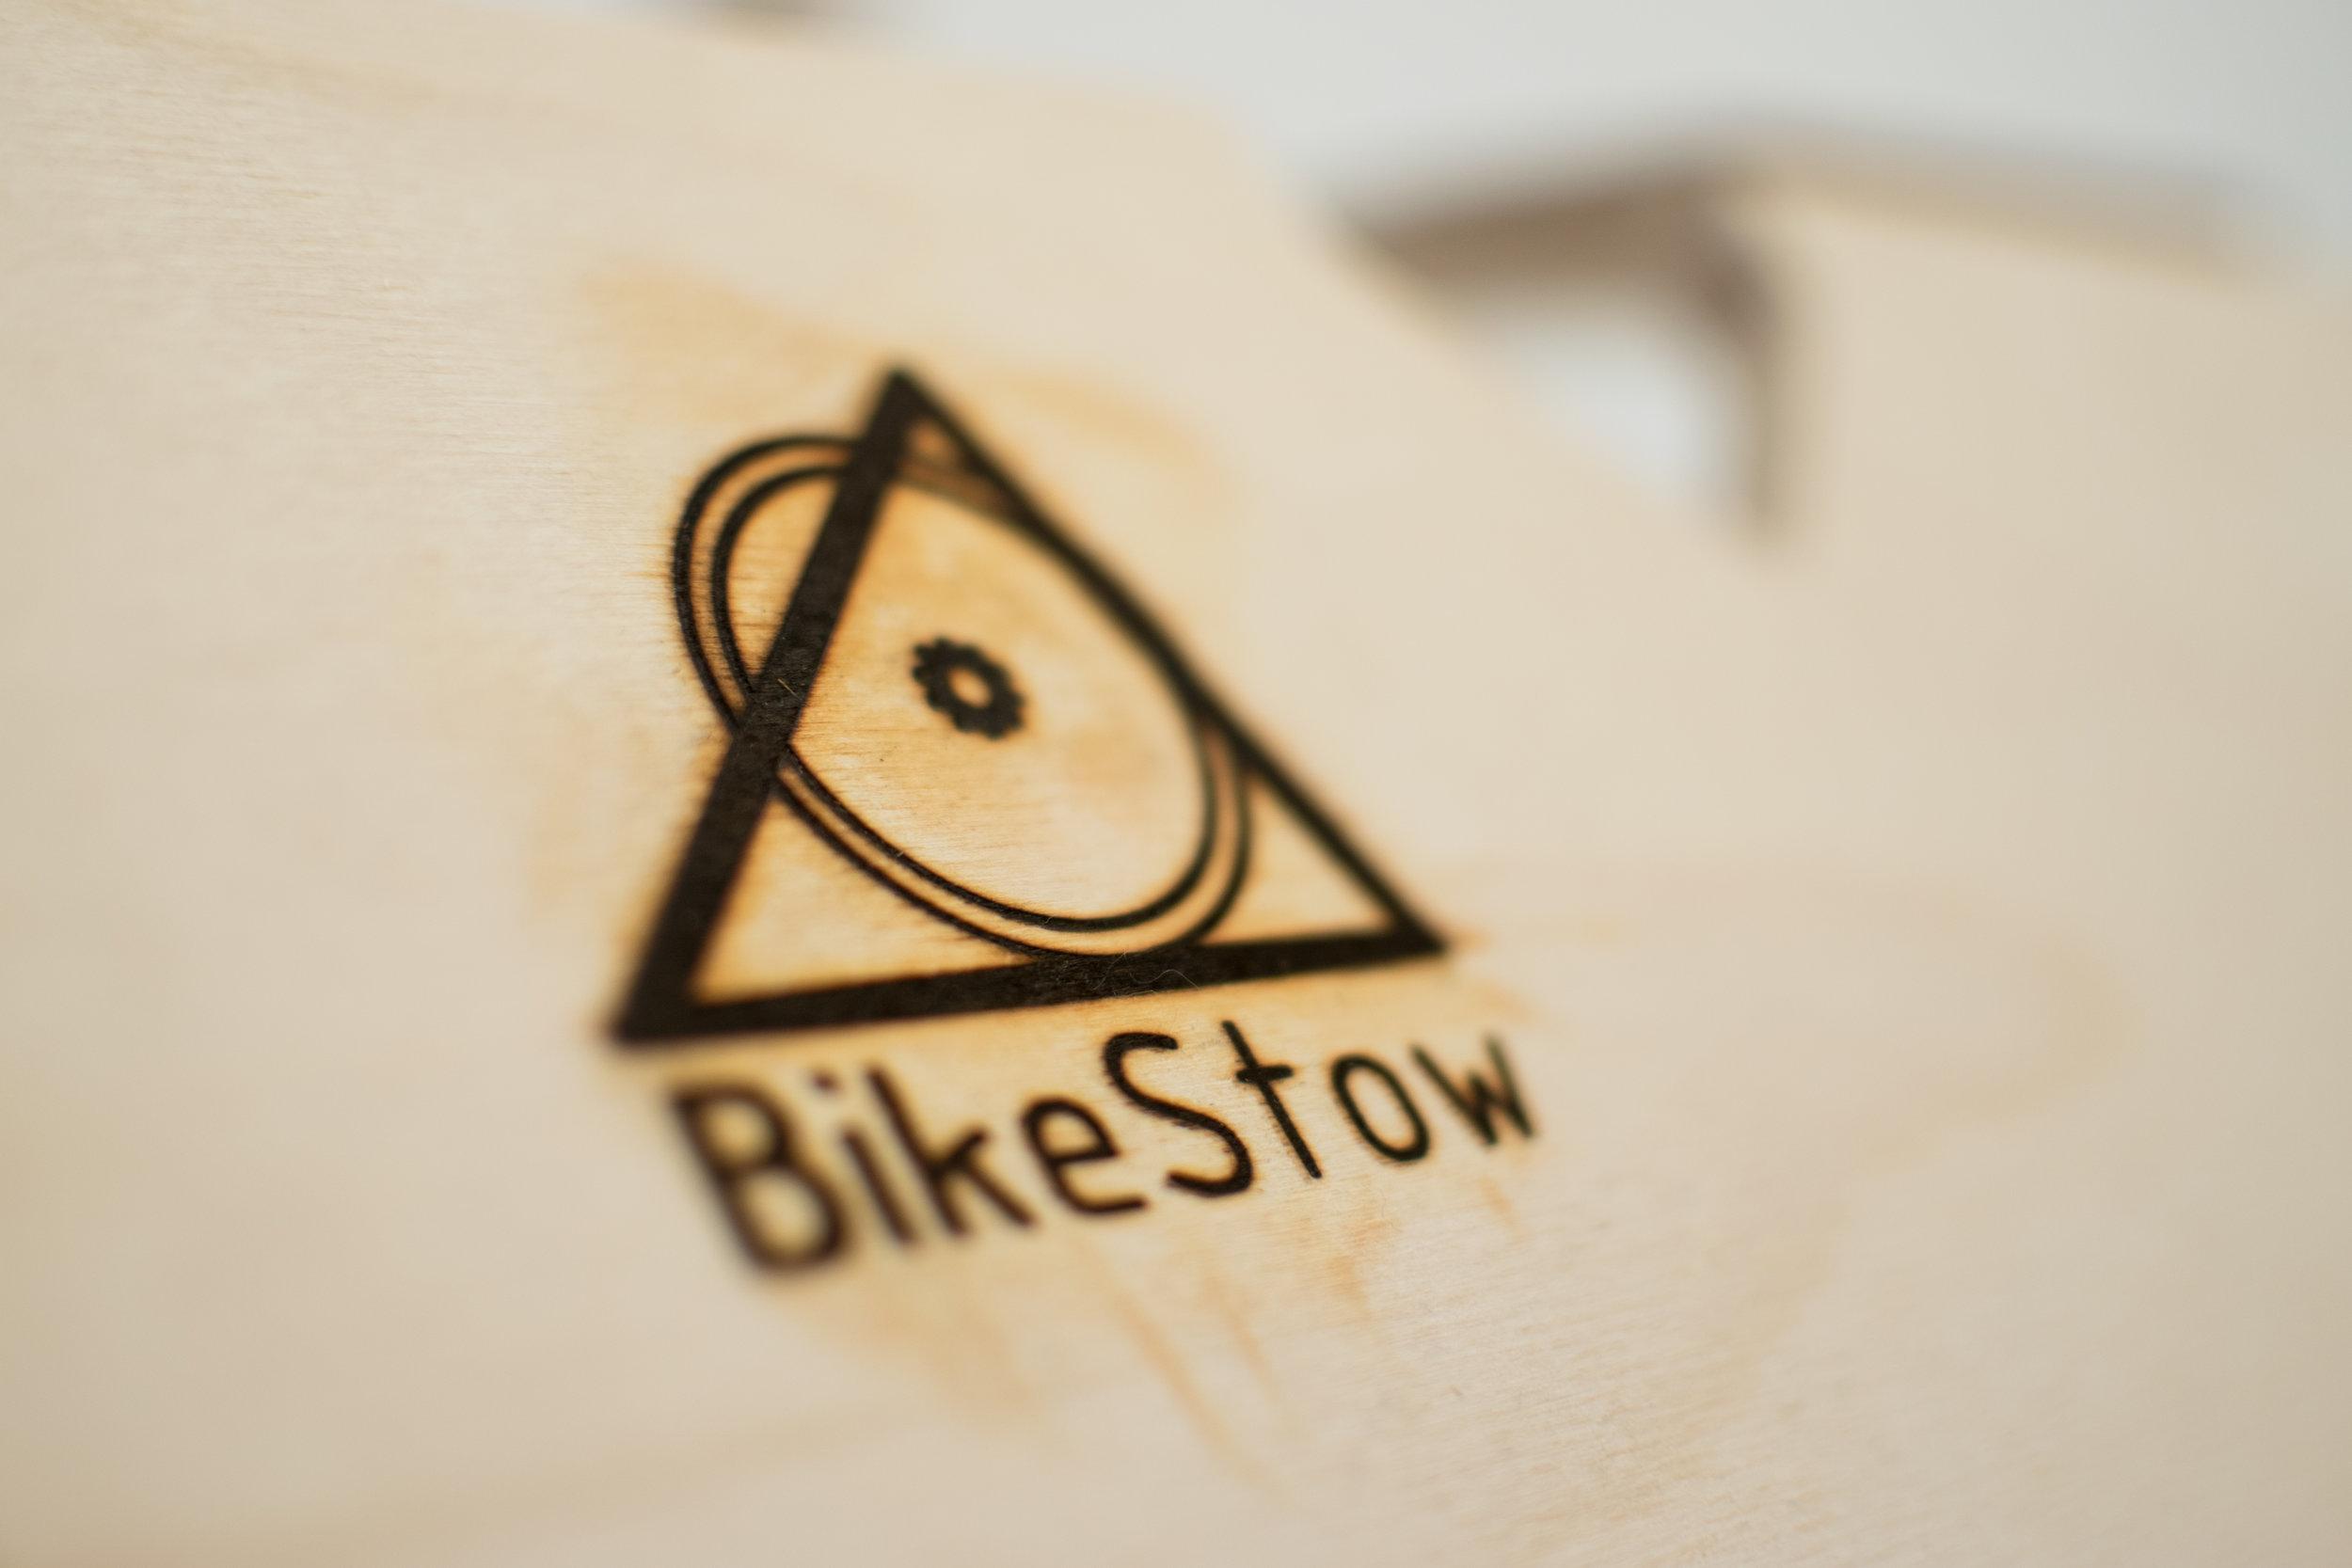 bikestow-0317.jpg